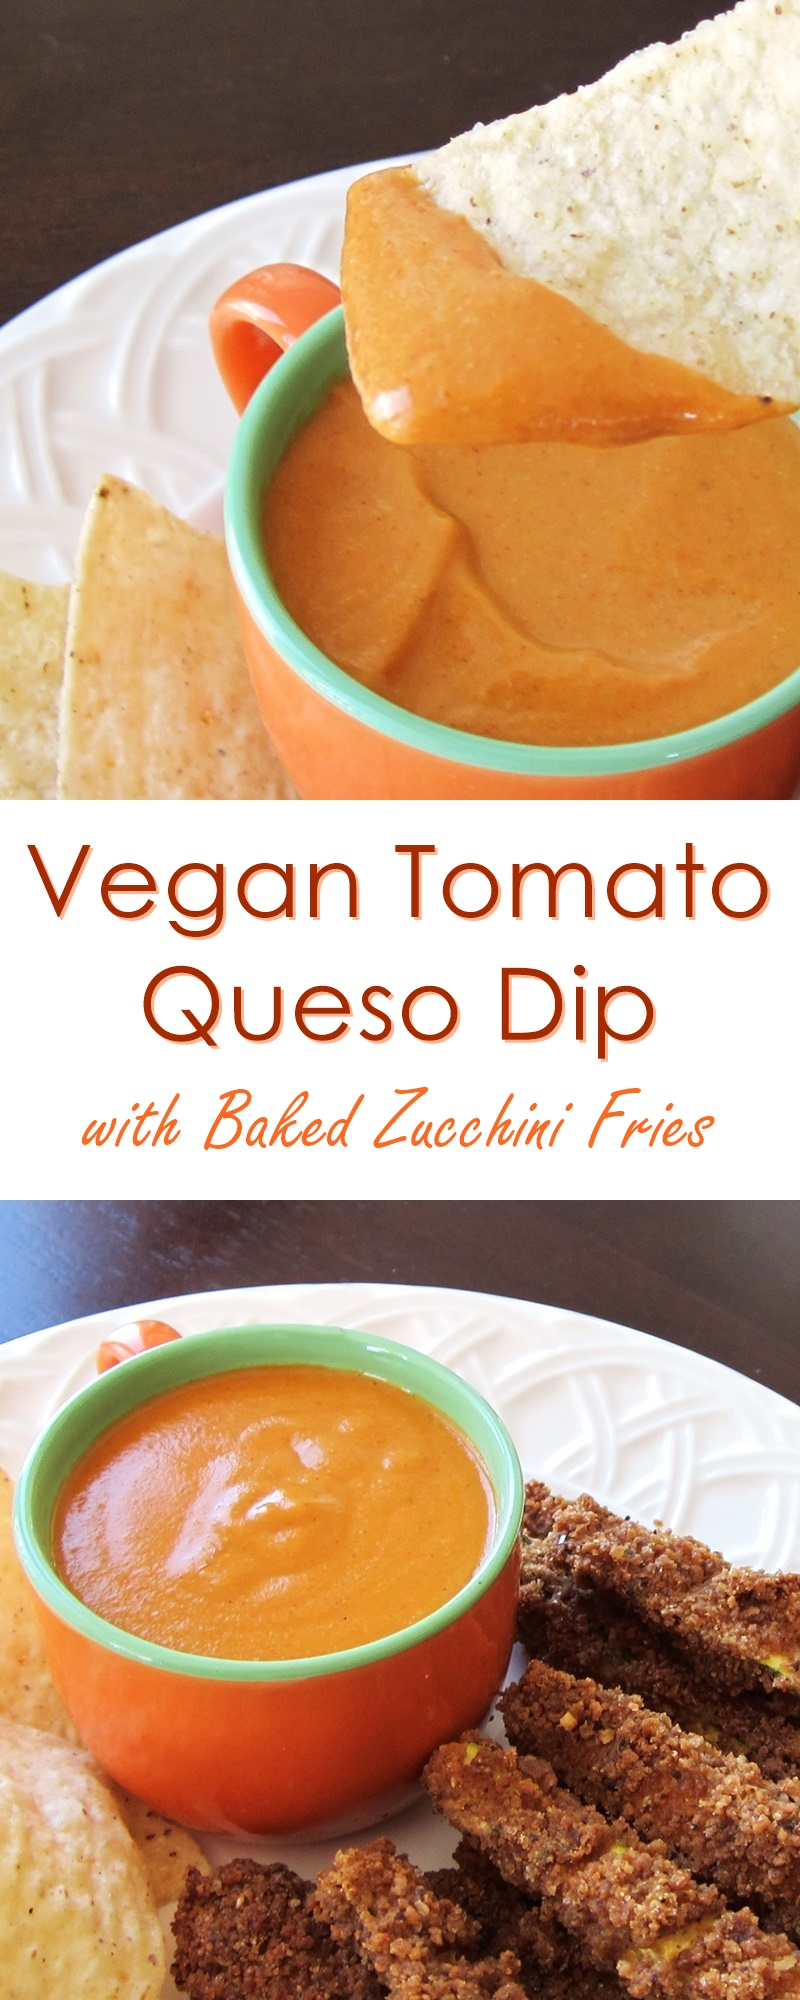 Crockpot Vegan Tomato Queso Dip (Dairy-Free Recipe)